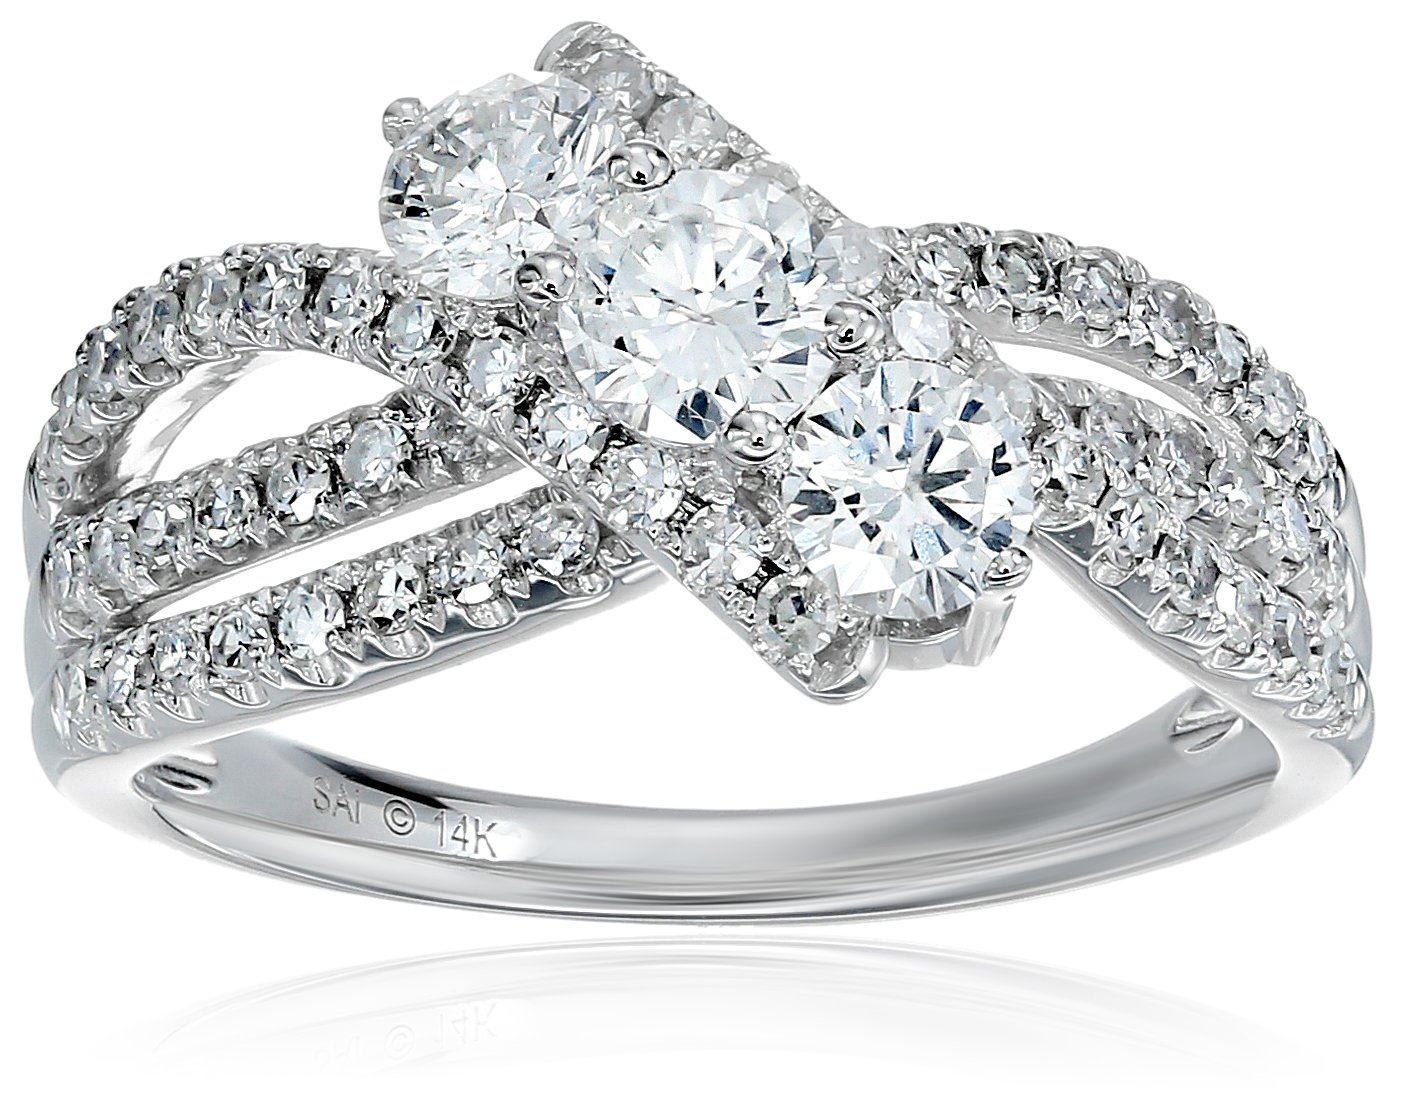 14k White Gold Diamond 3-Stone Twisted Engagement Ring (1 1/4cttw, H-I Color, I1-I2 Clarity), Size 7